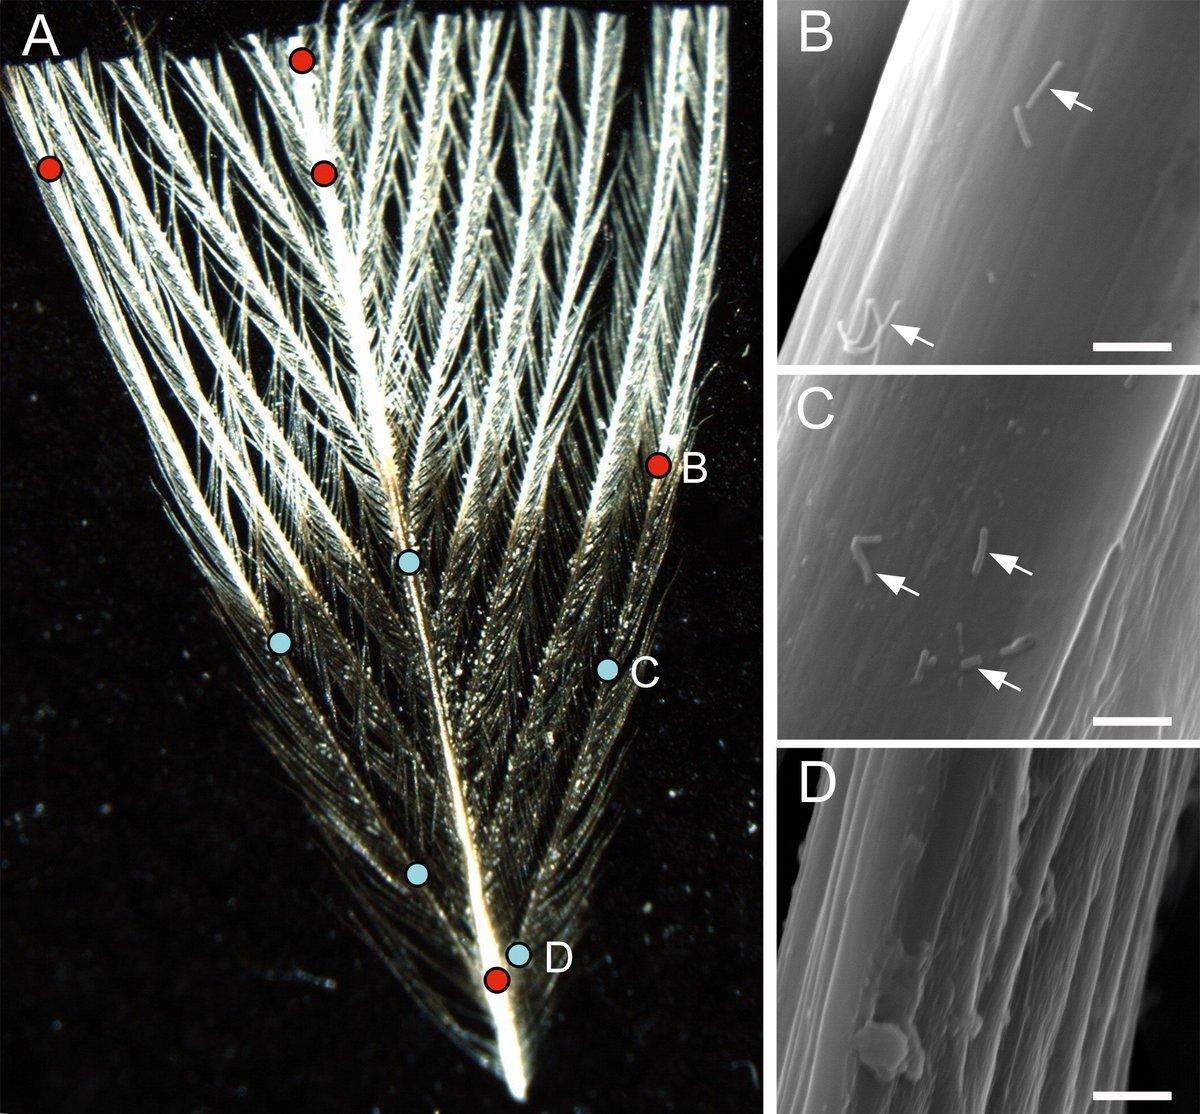 From 2017: Preferential attachment & colonization of the keratinolytic bacterium Bacillus licheniformis on black- & white-striped feathers americanornithologypubs.org/doi/full/10.16… #OA #ornithology